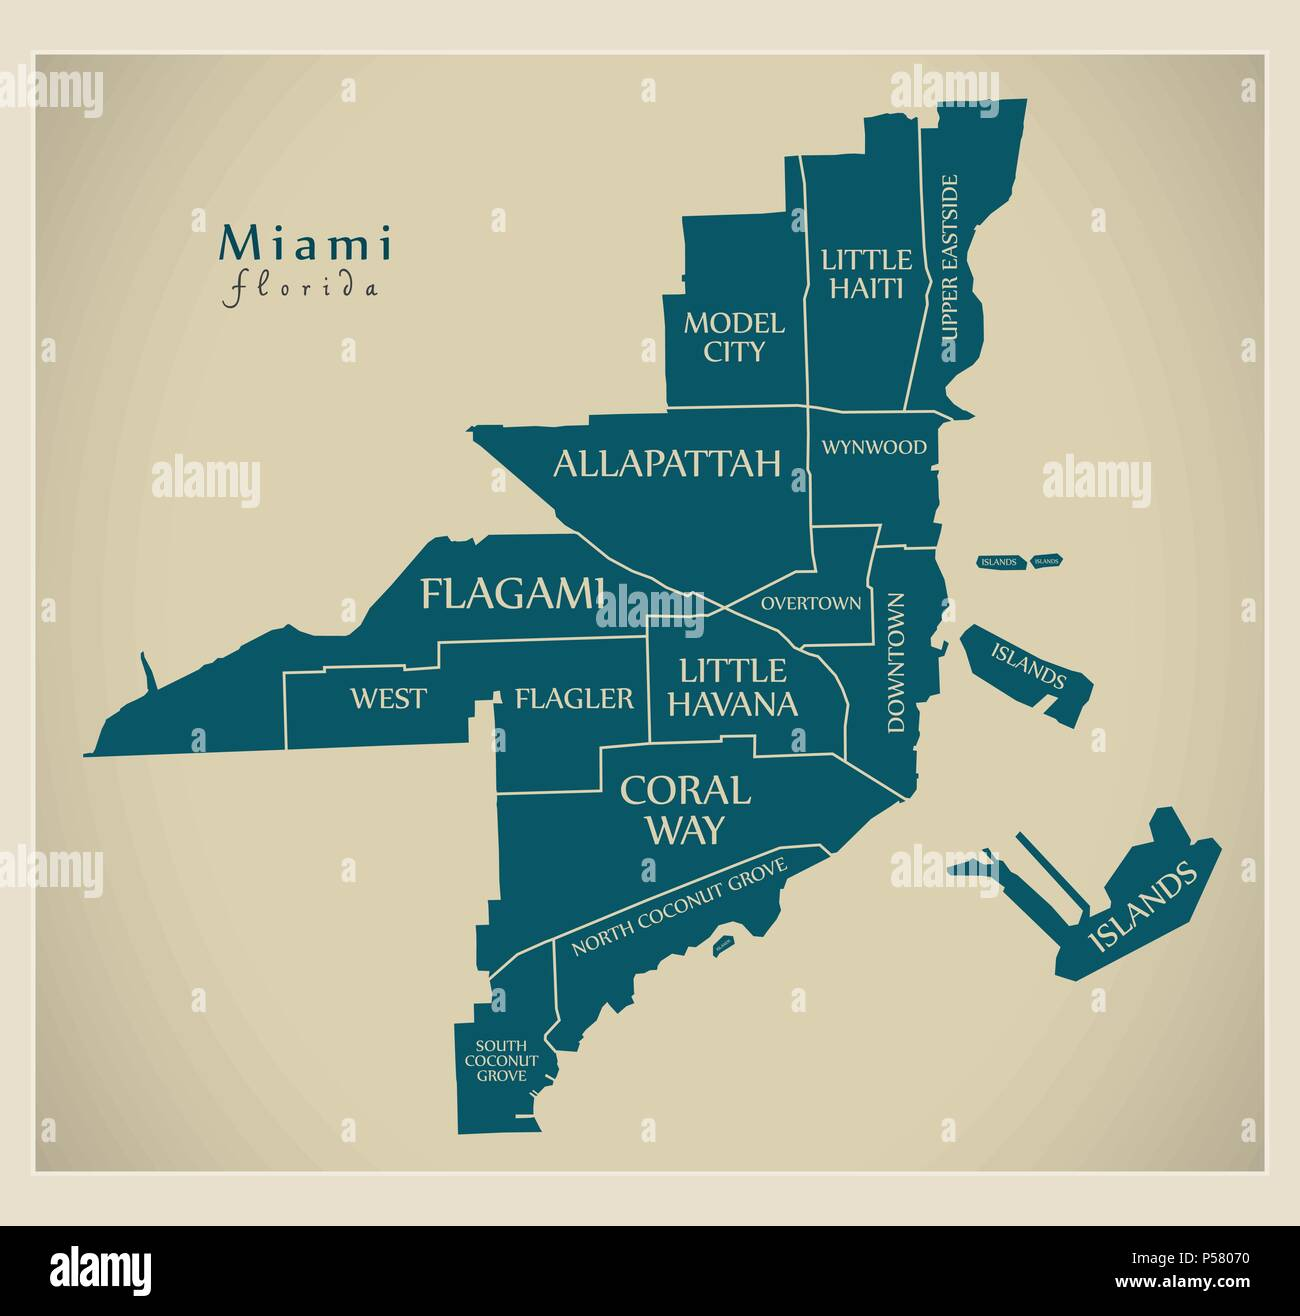 Modern City Map Miami Florida City Of The Usa With Neighborhoods